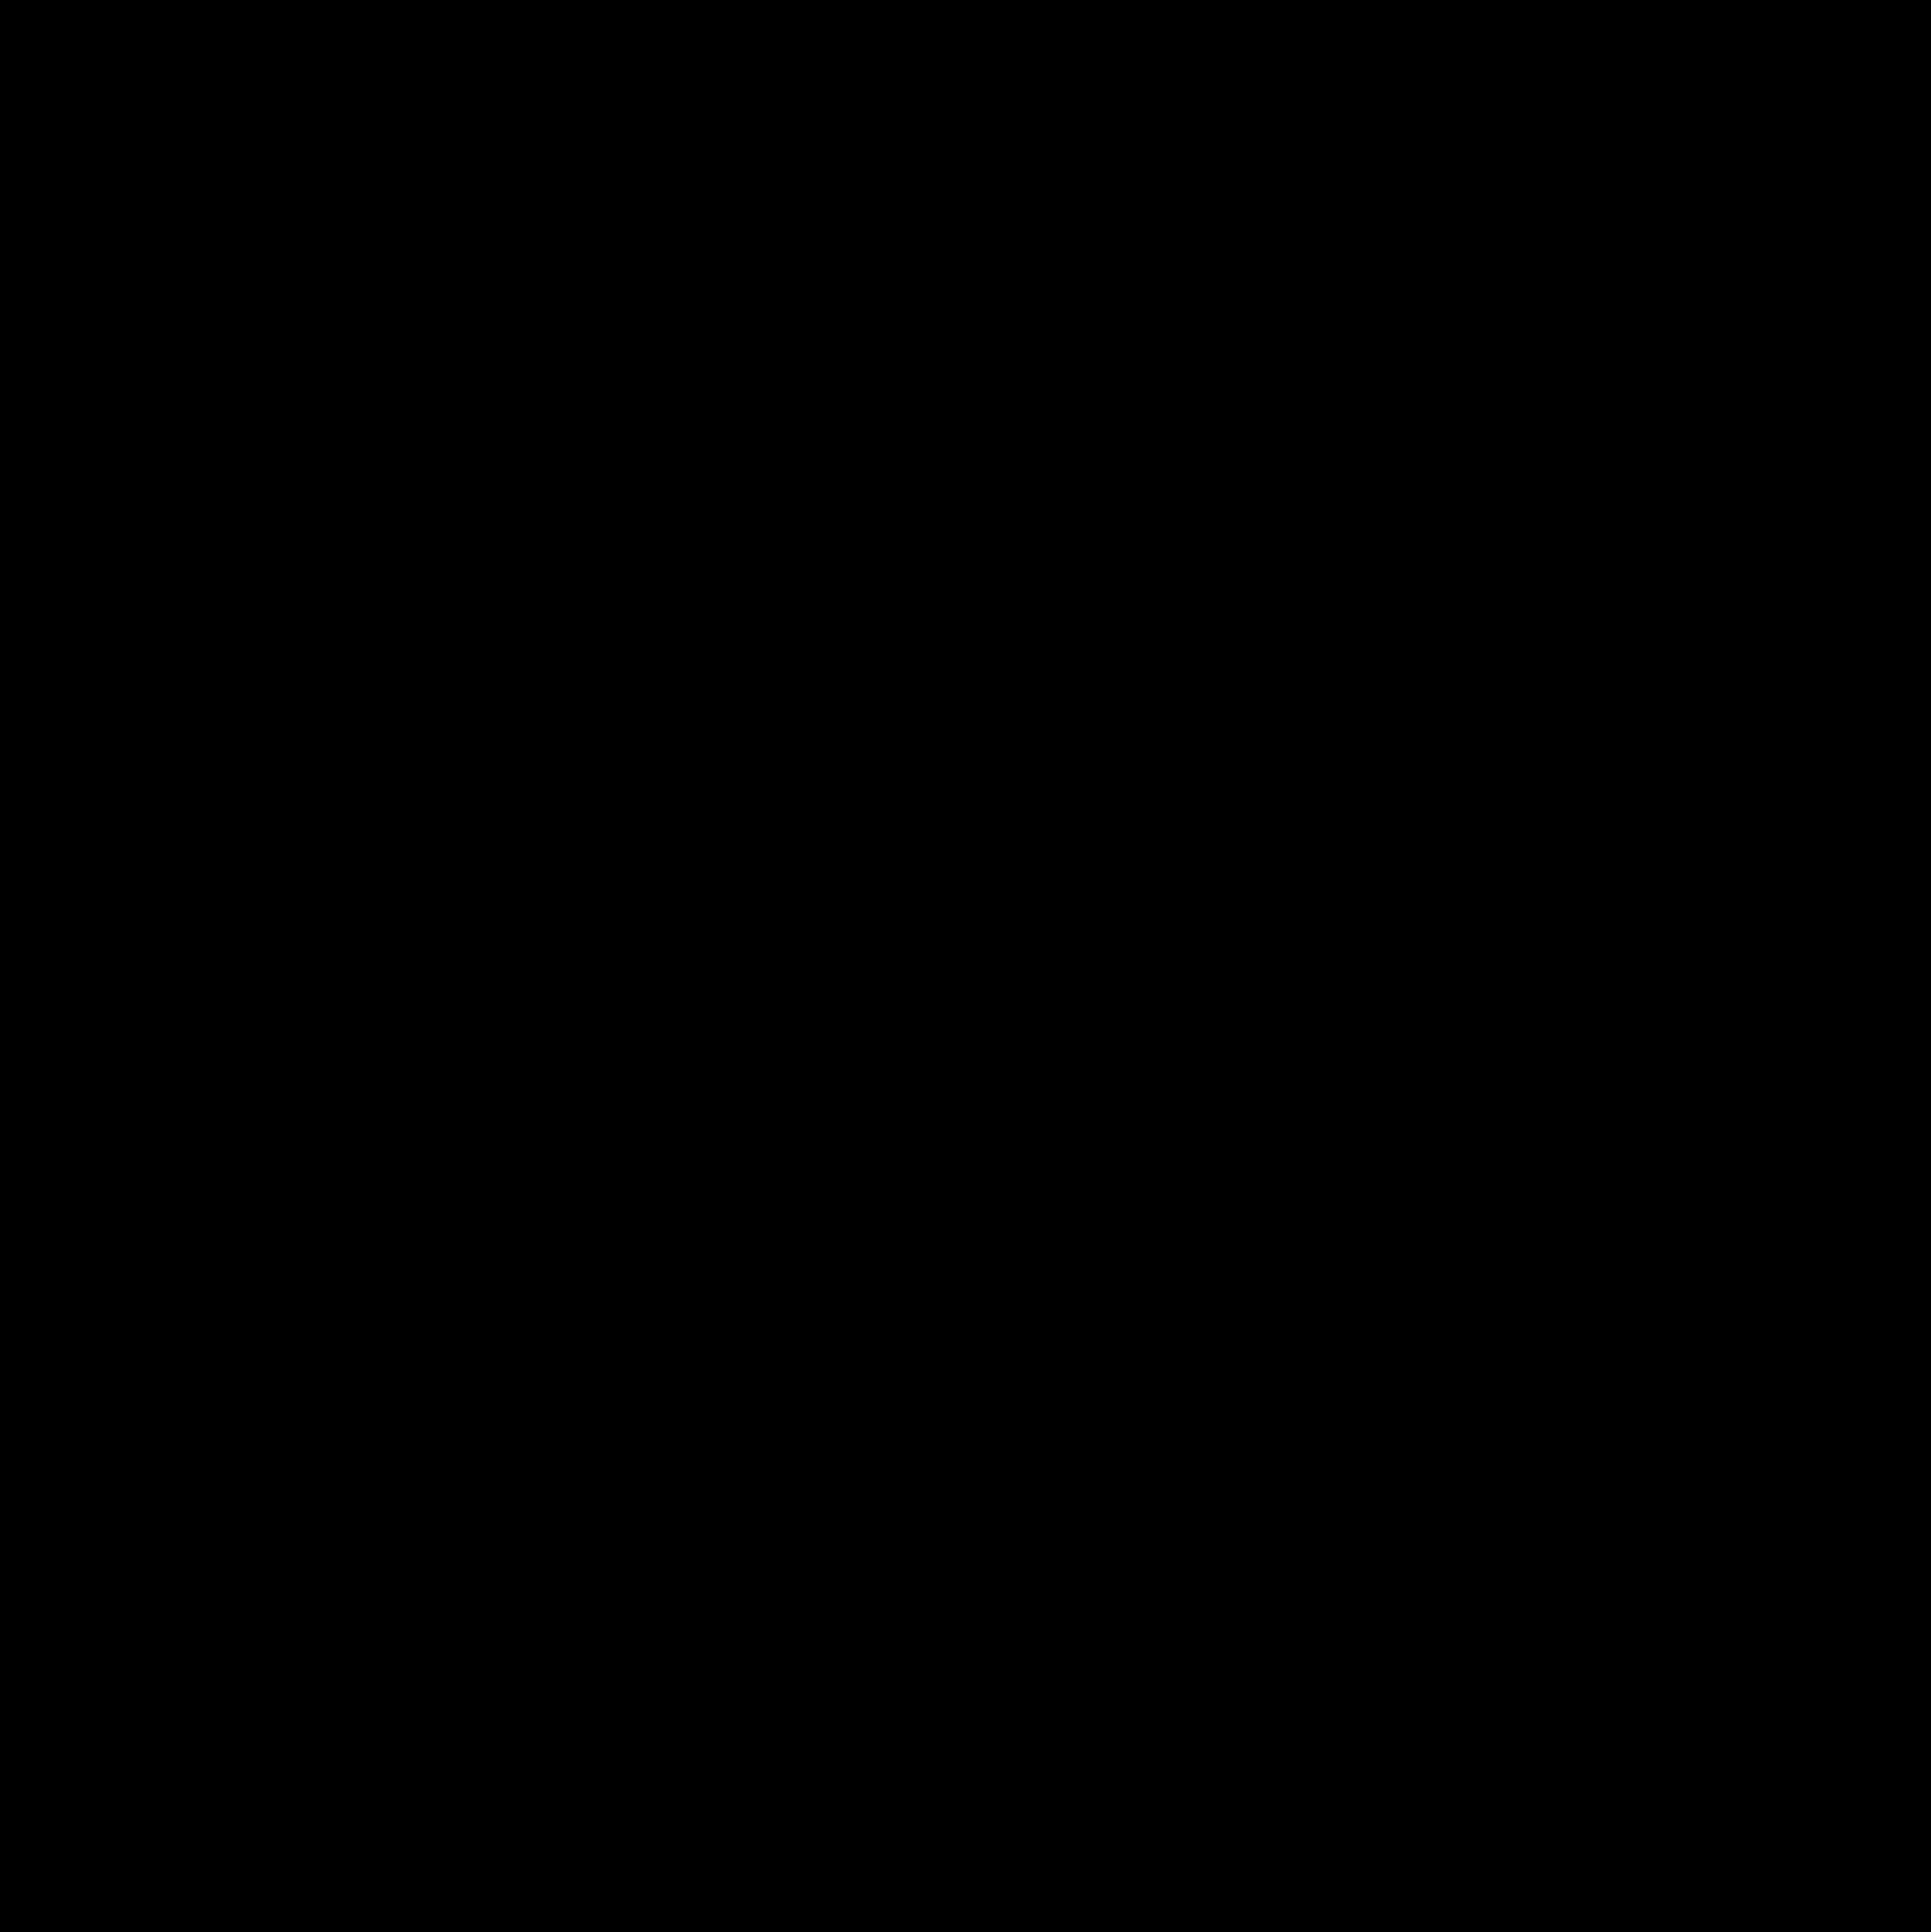 icon_port_black-01 copy.png